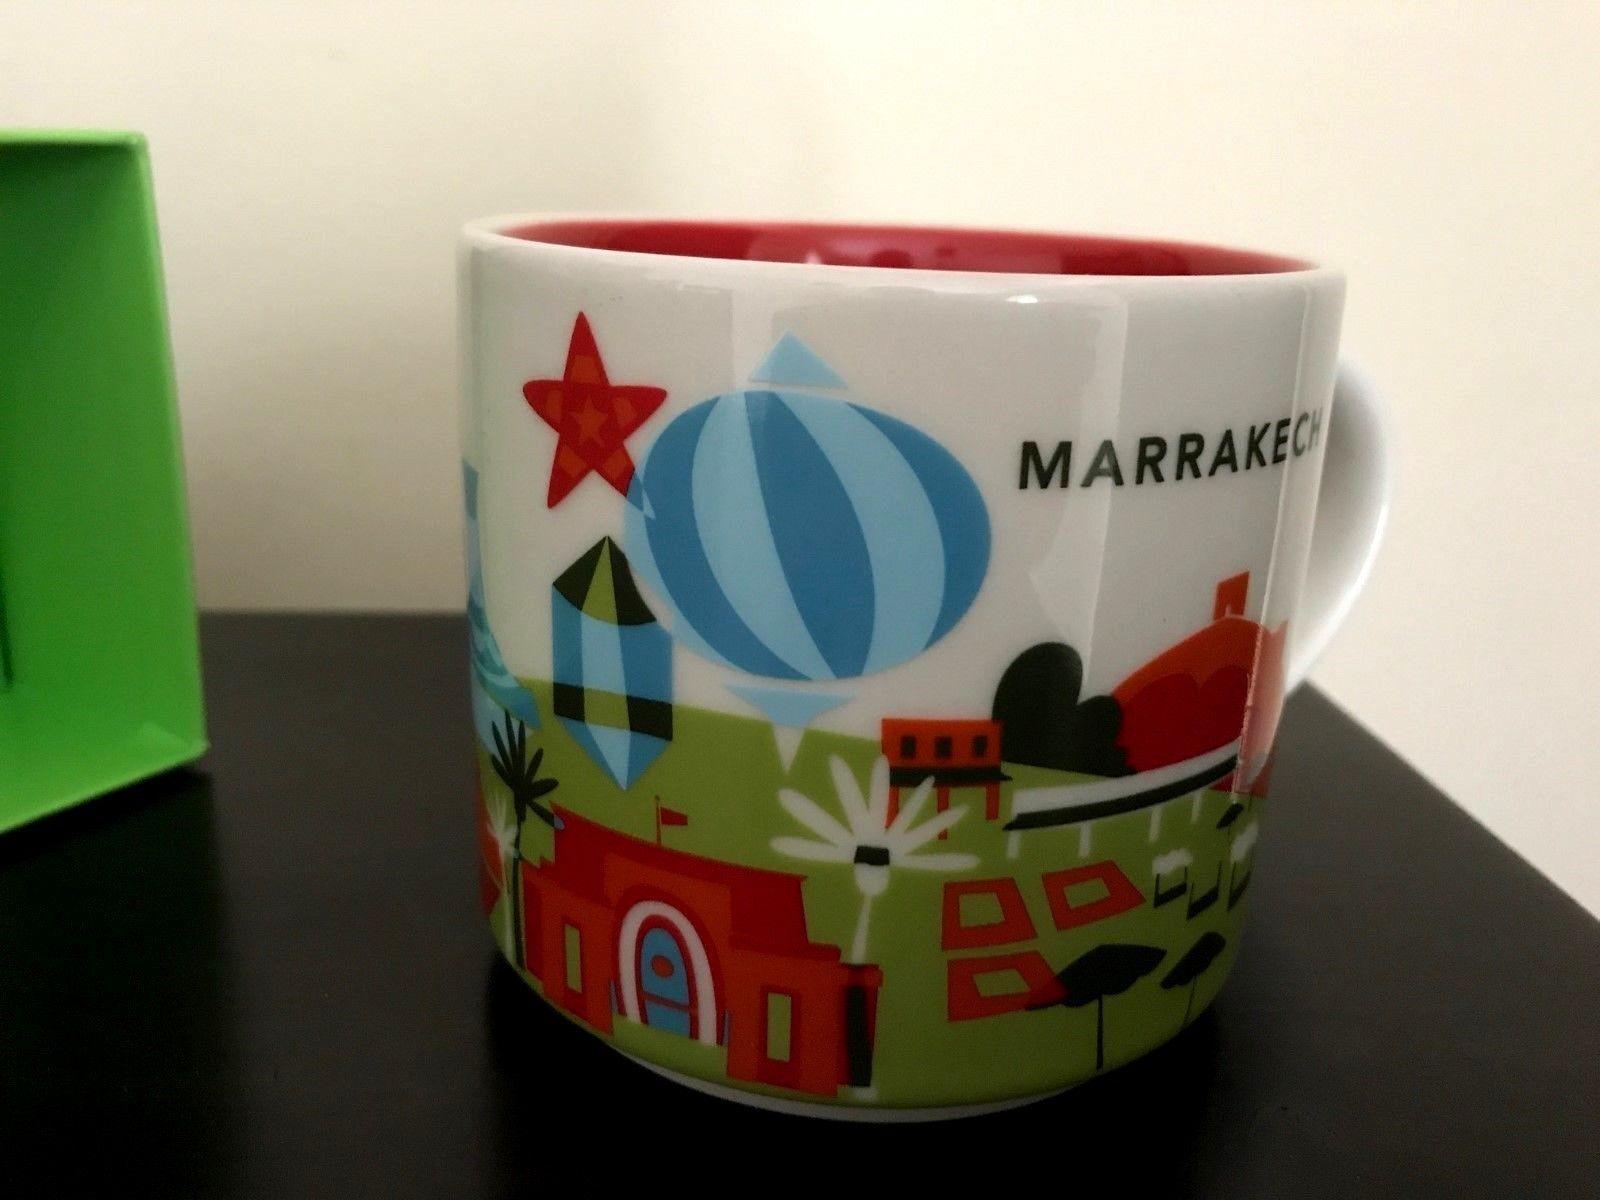 City Mugs InternationalStarbucks Are Here You JcT1FlK